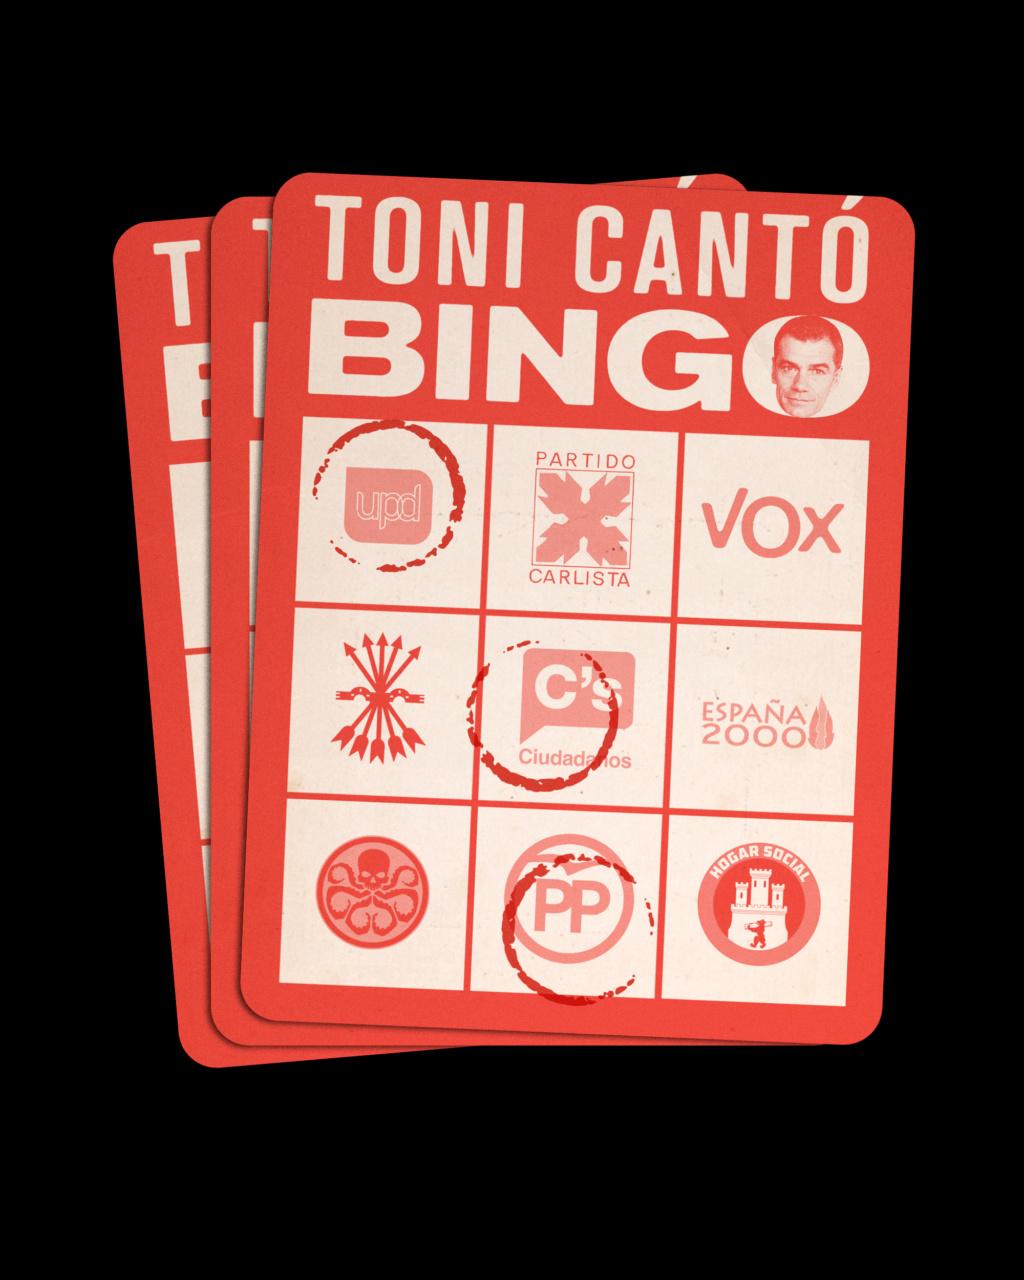 Toni Cantó vuelve a cambiar de Partido Político. - Página 9 20210318